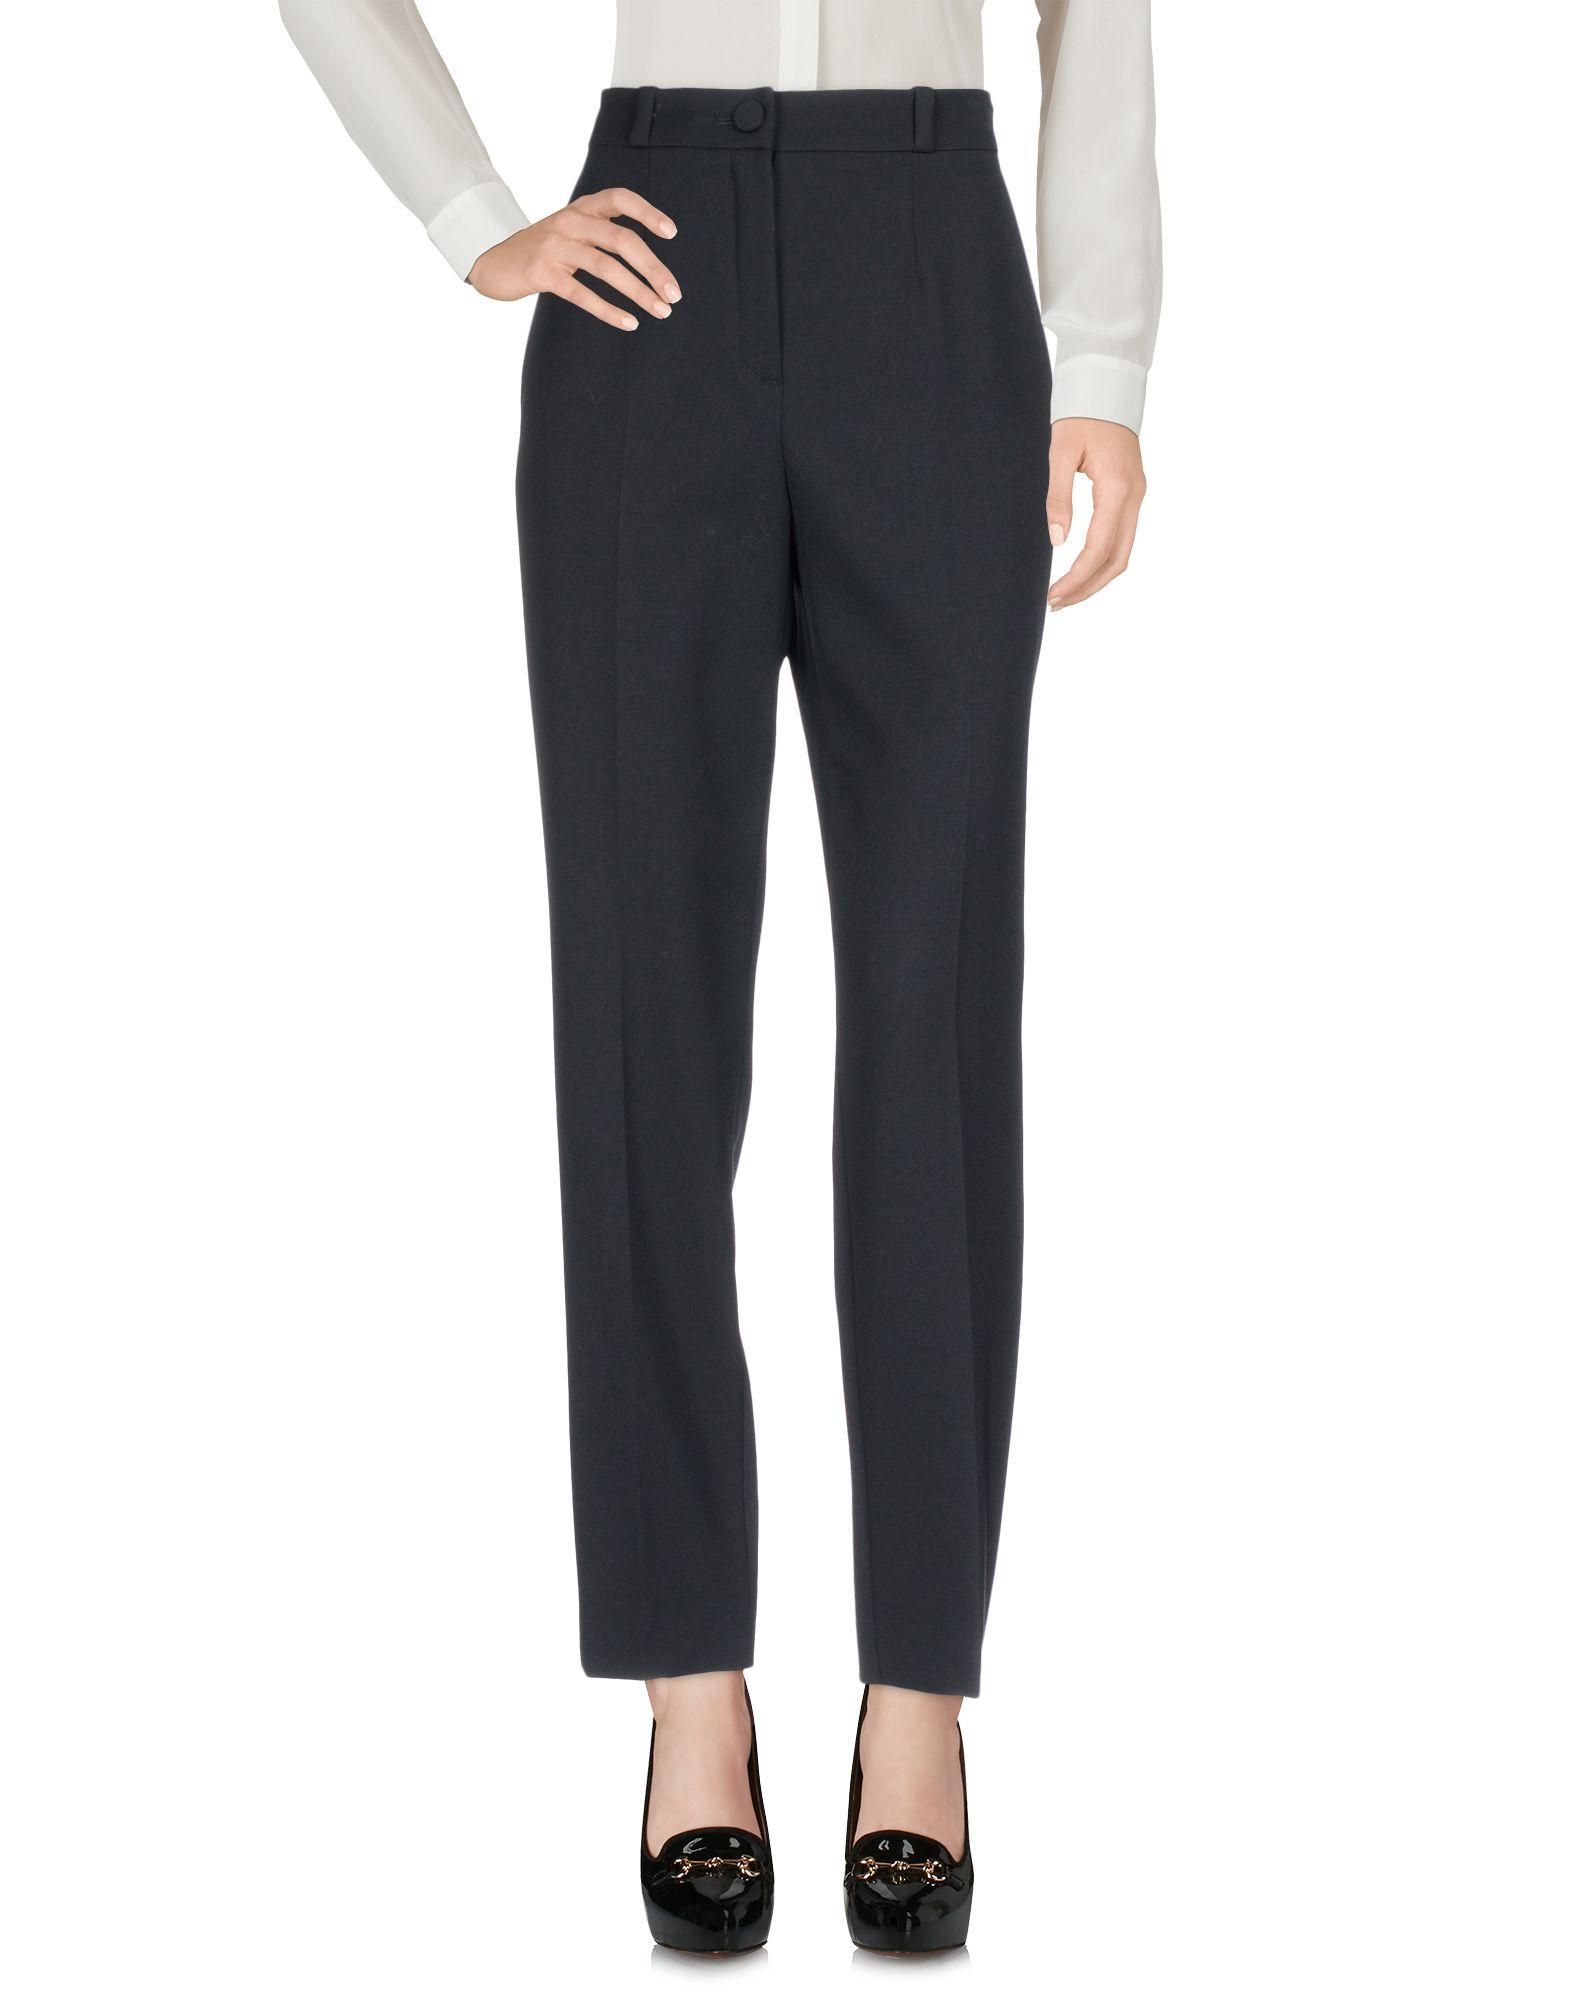 Pantalone Lanvin Donna - Acquista online su RzyrGMM9